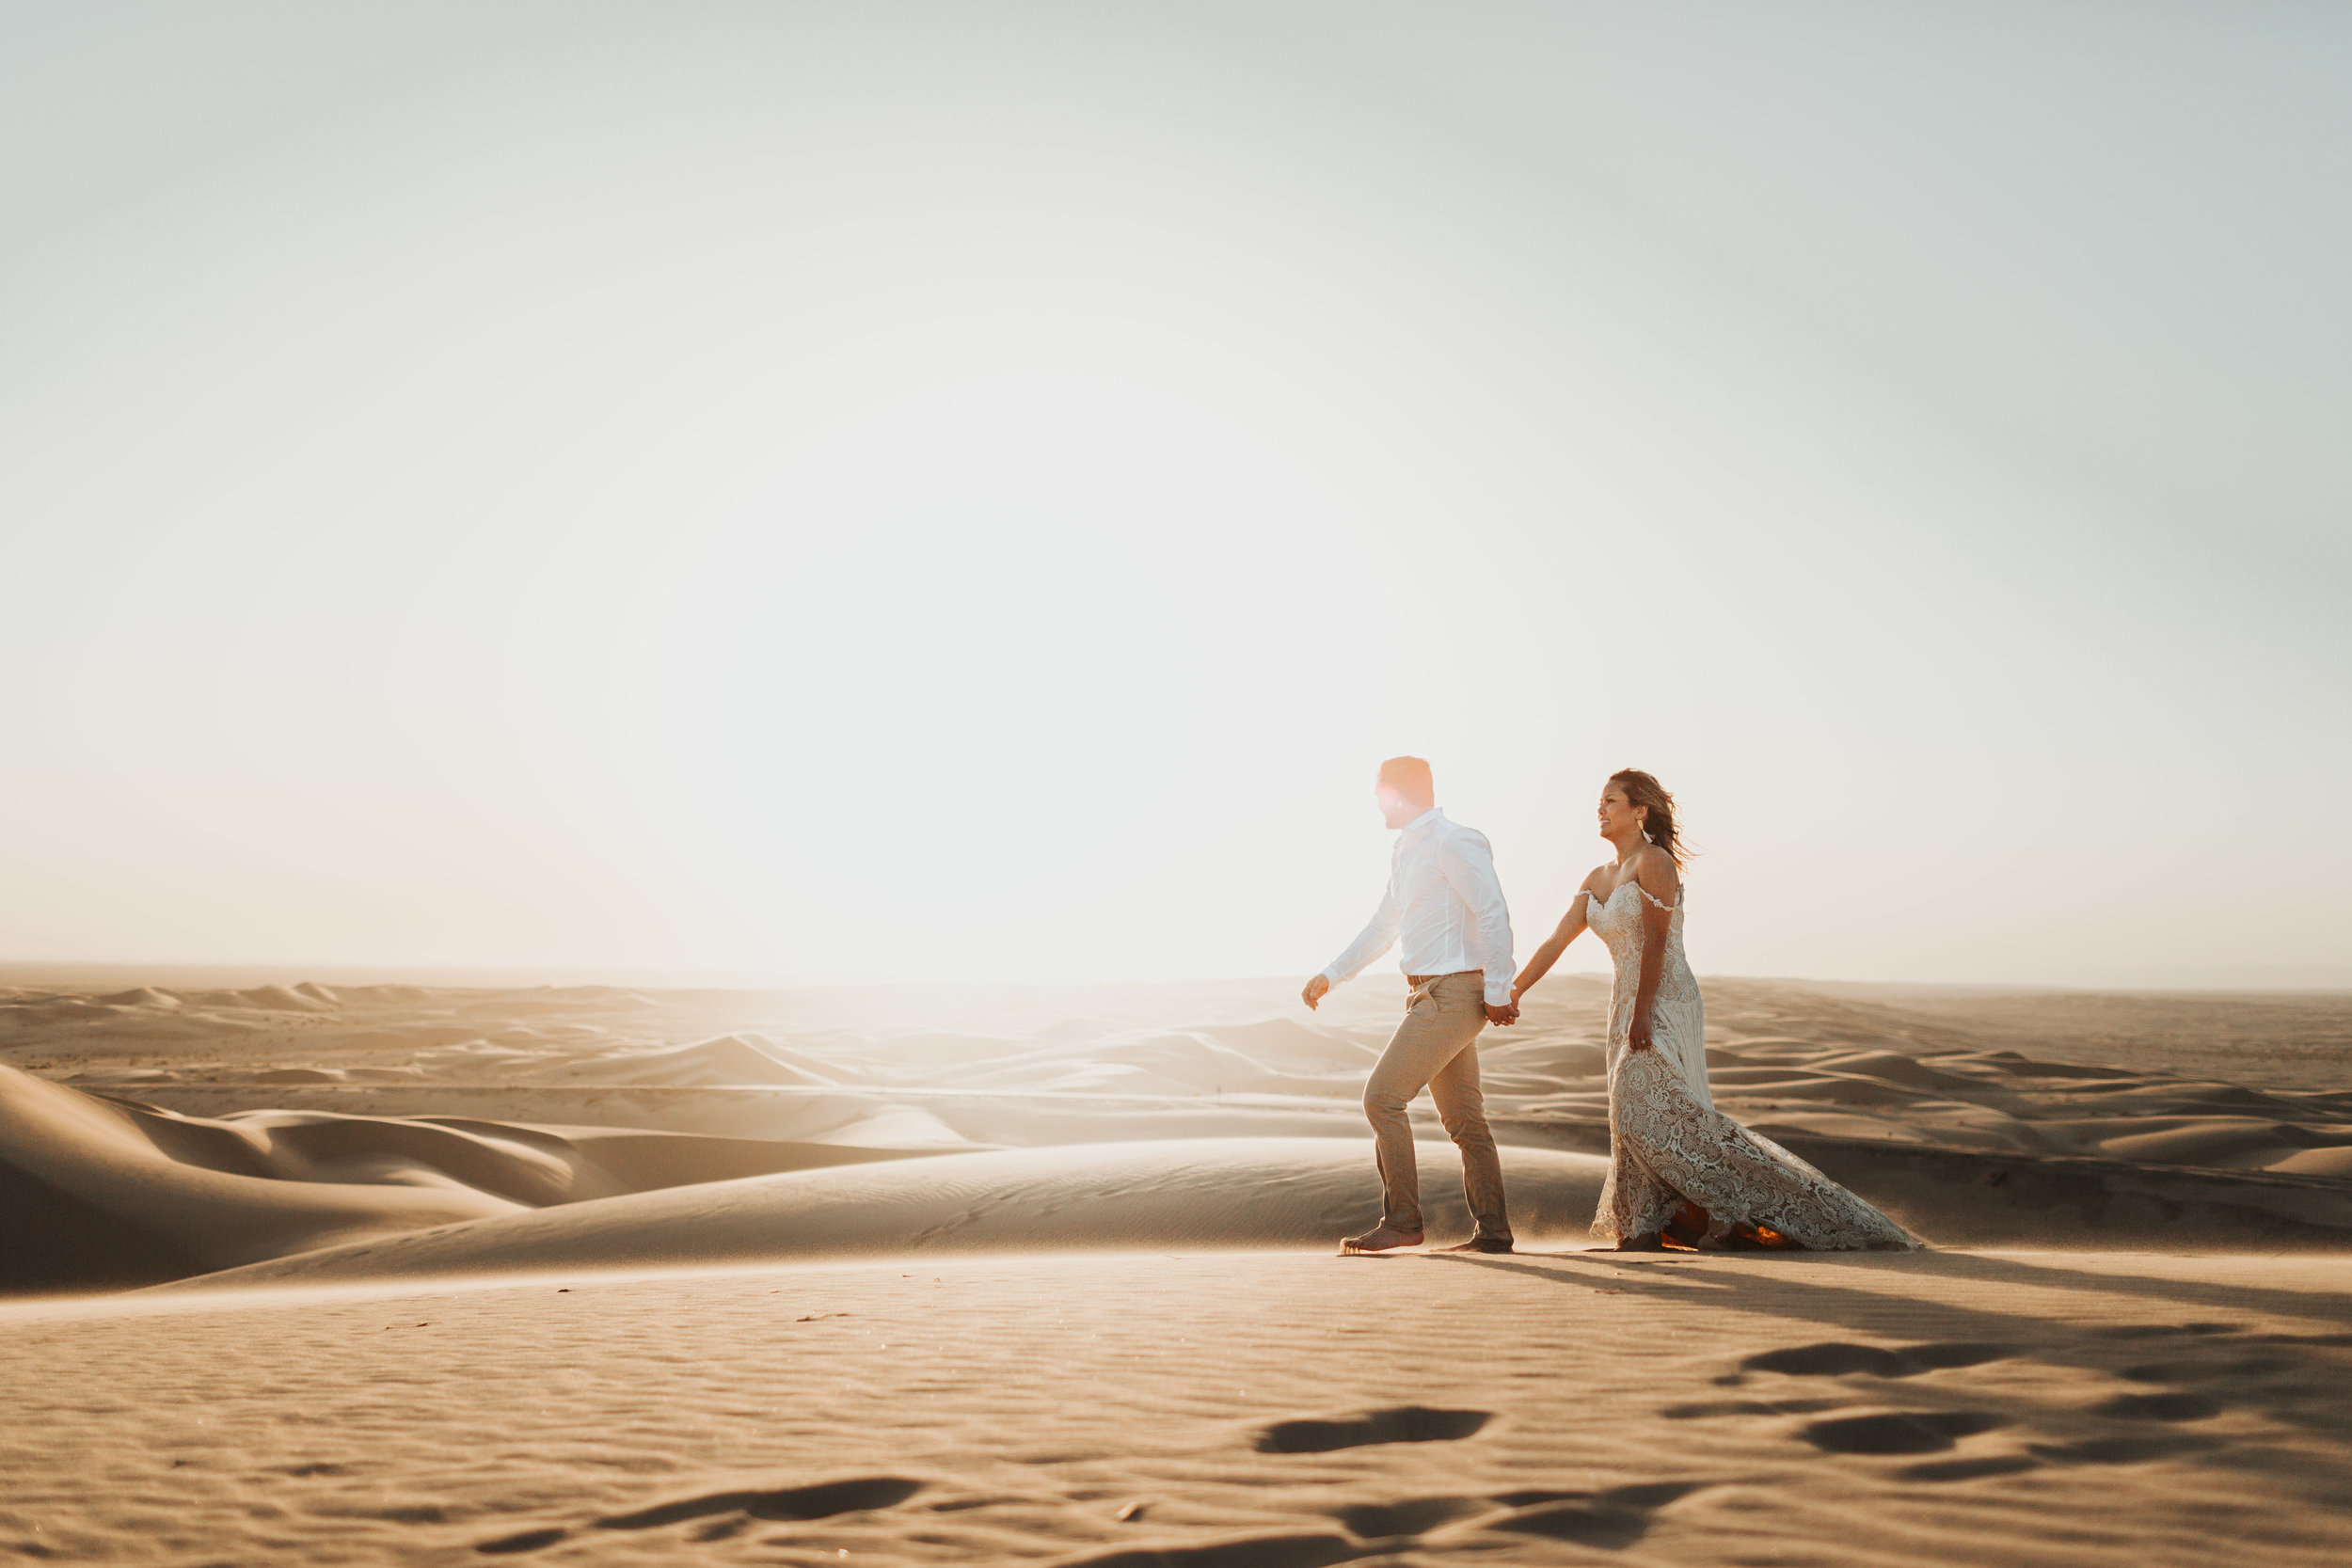 imperial sand dunes destination styled elopement golden hour